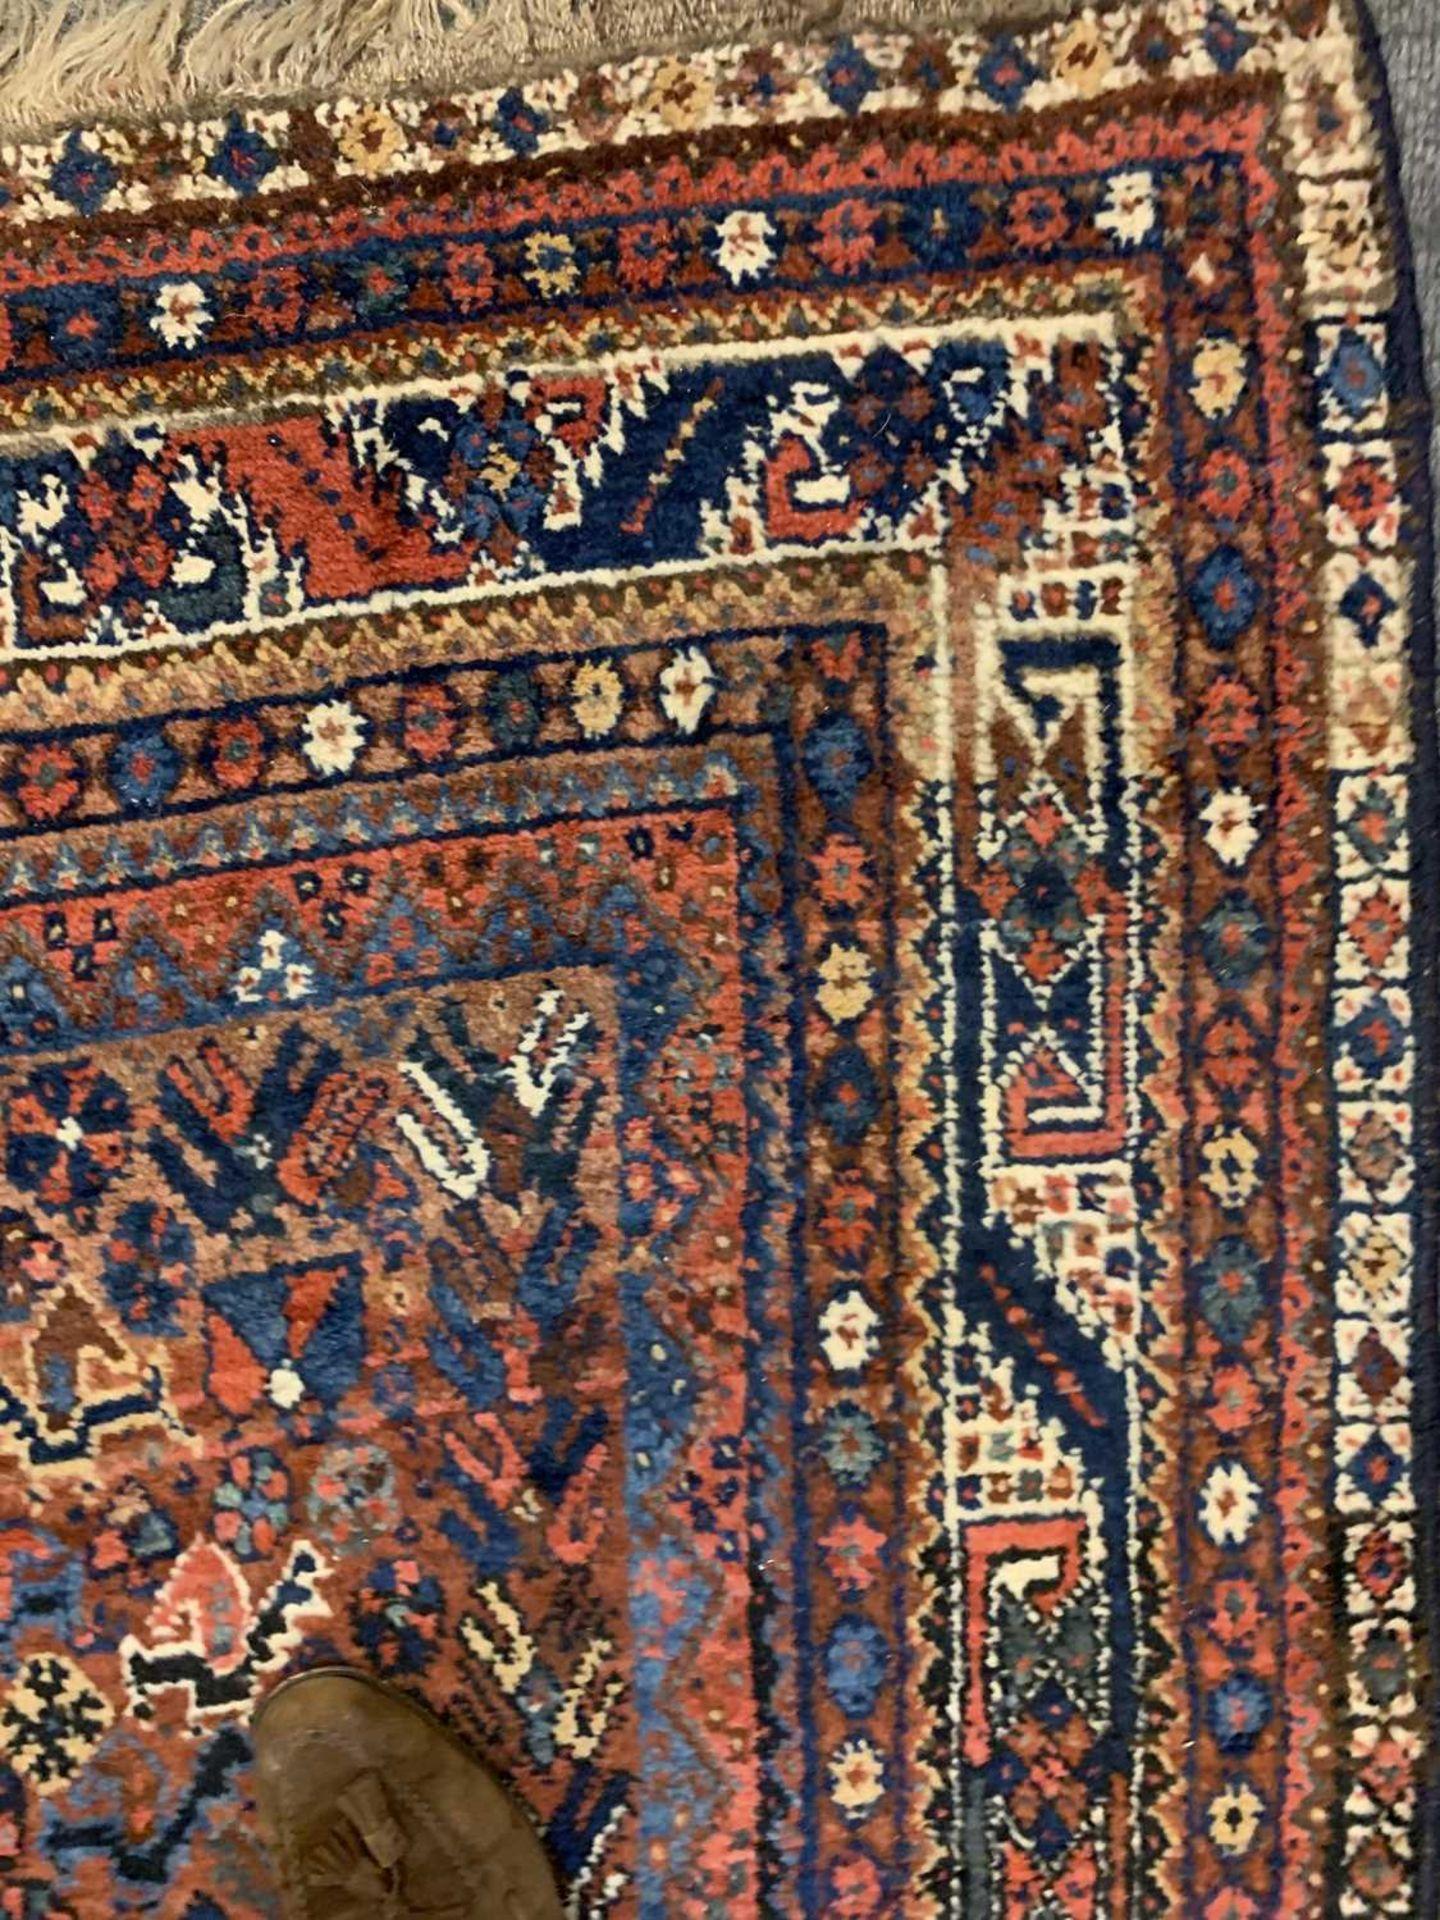 A South West Persian Khamseh carpet, - Image 12 of 17